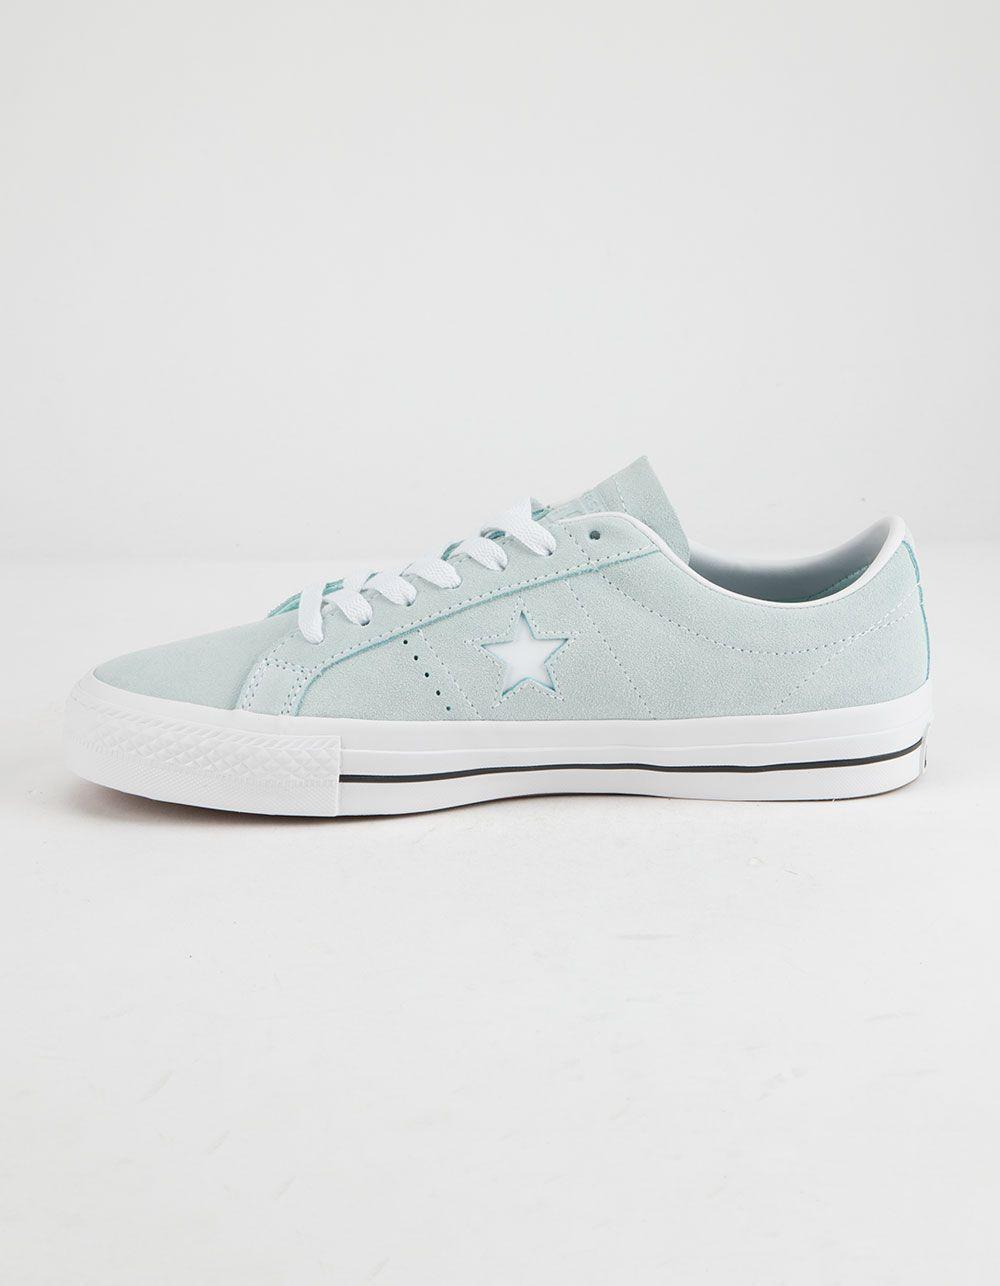 Elegante lazo desierto  CONVERSE One Star Pro OX Teal Tint Shoes - TEAL - 335879034 in 2020   Converse  one star, Converse, One star